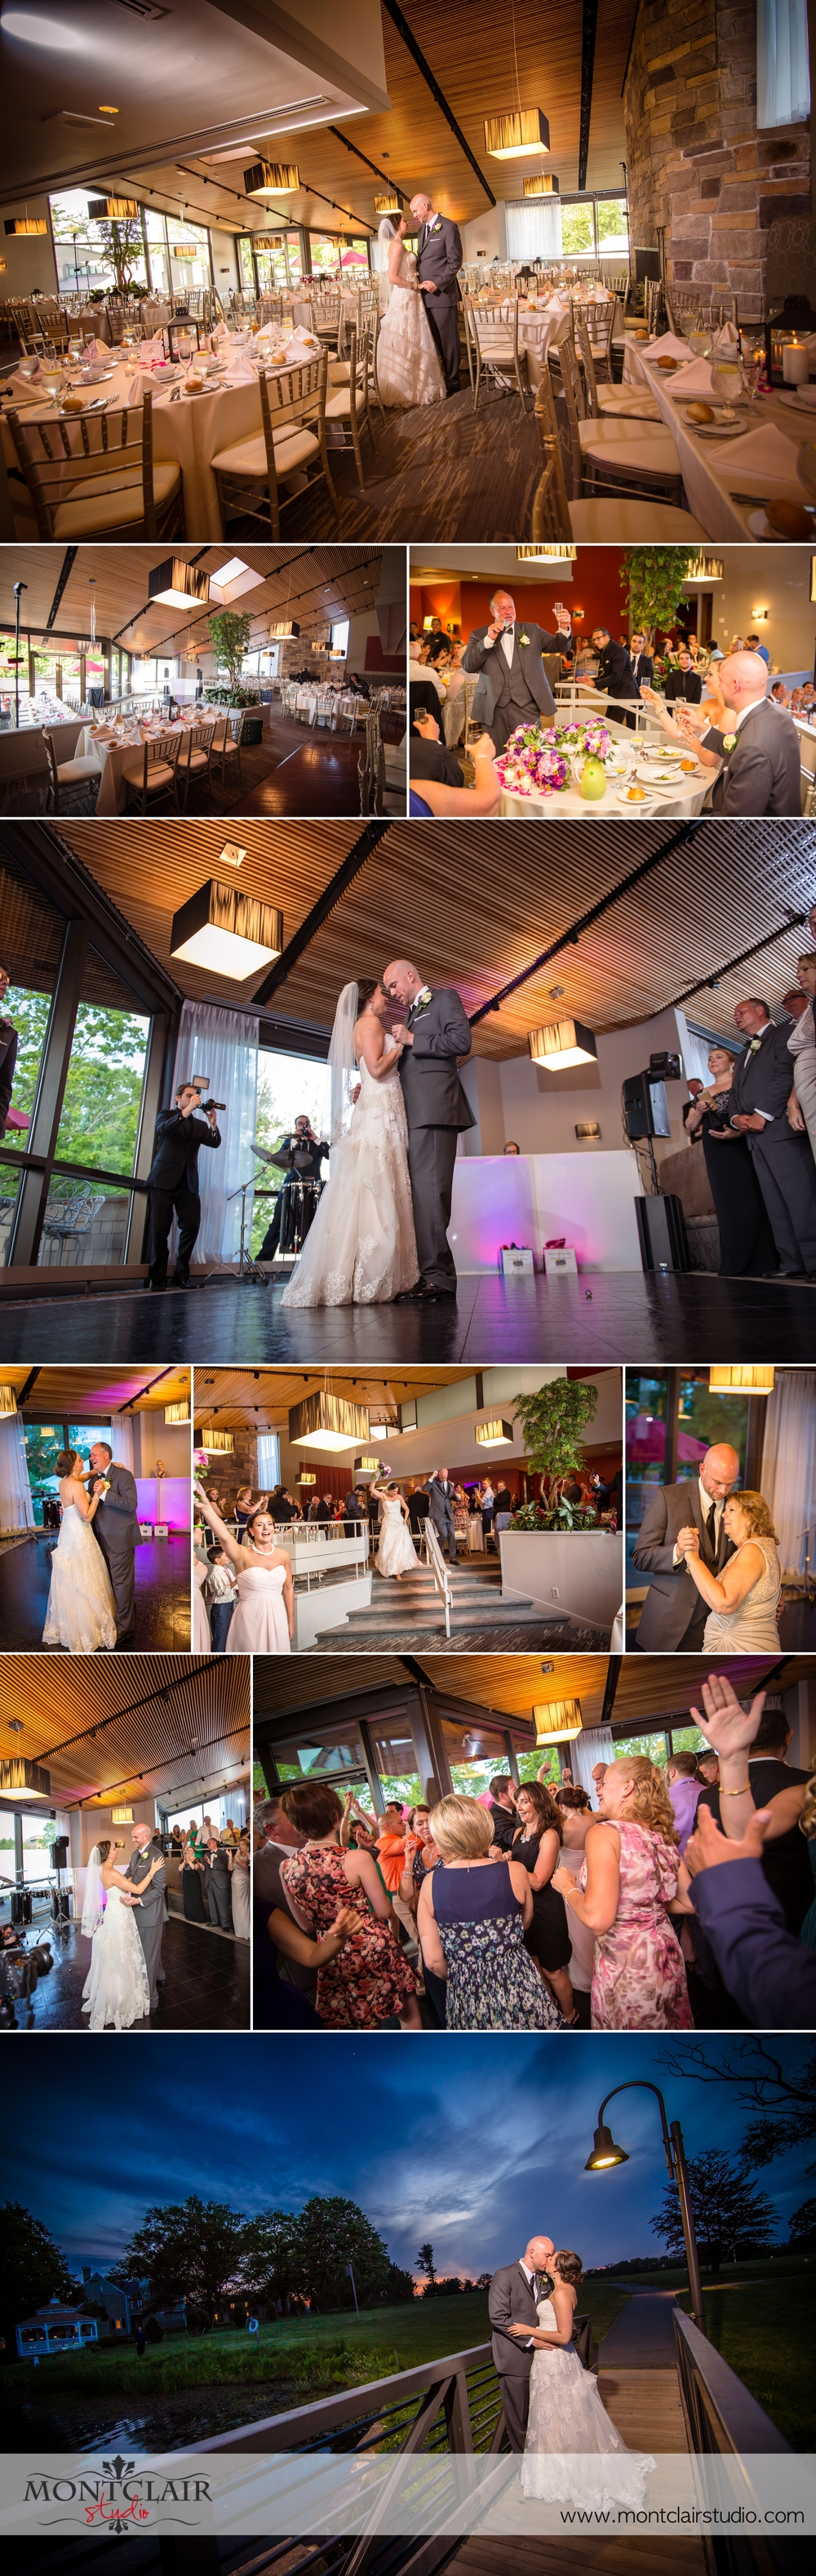 Wedding Chris and Allysa 3.jpg